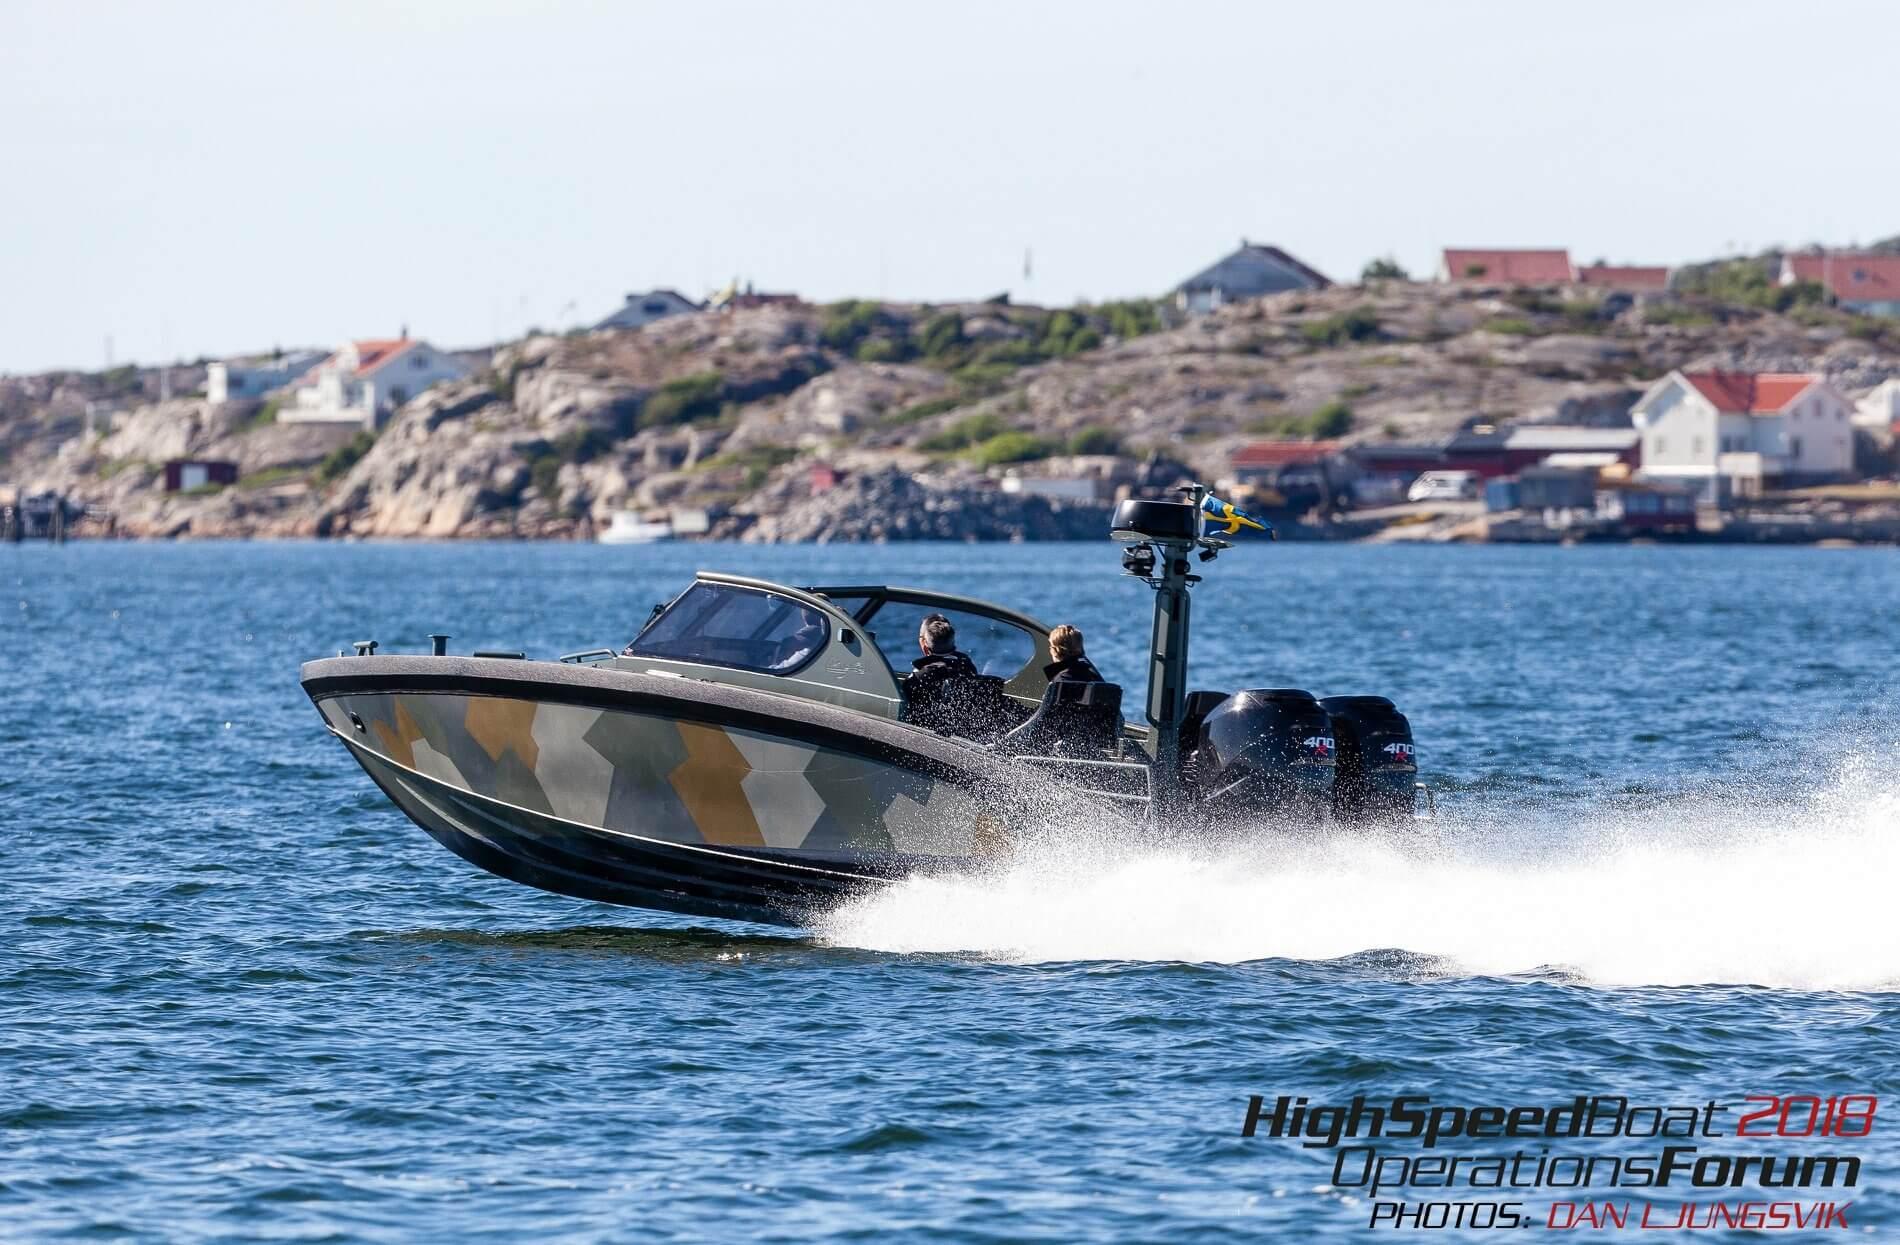 m9 interceptor boat